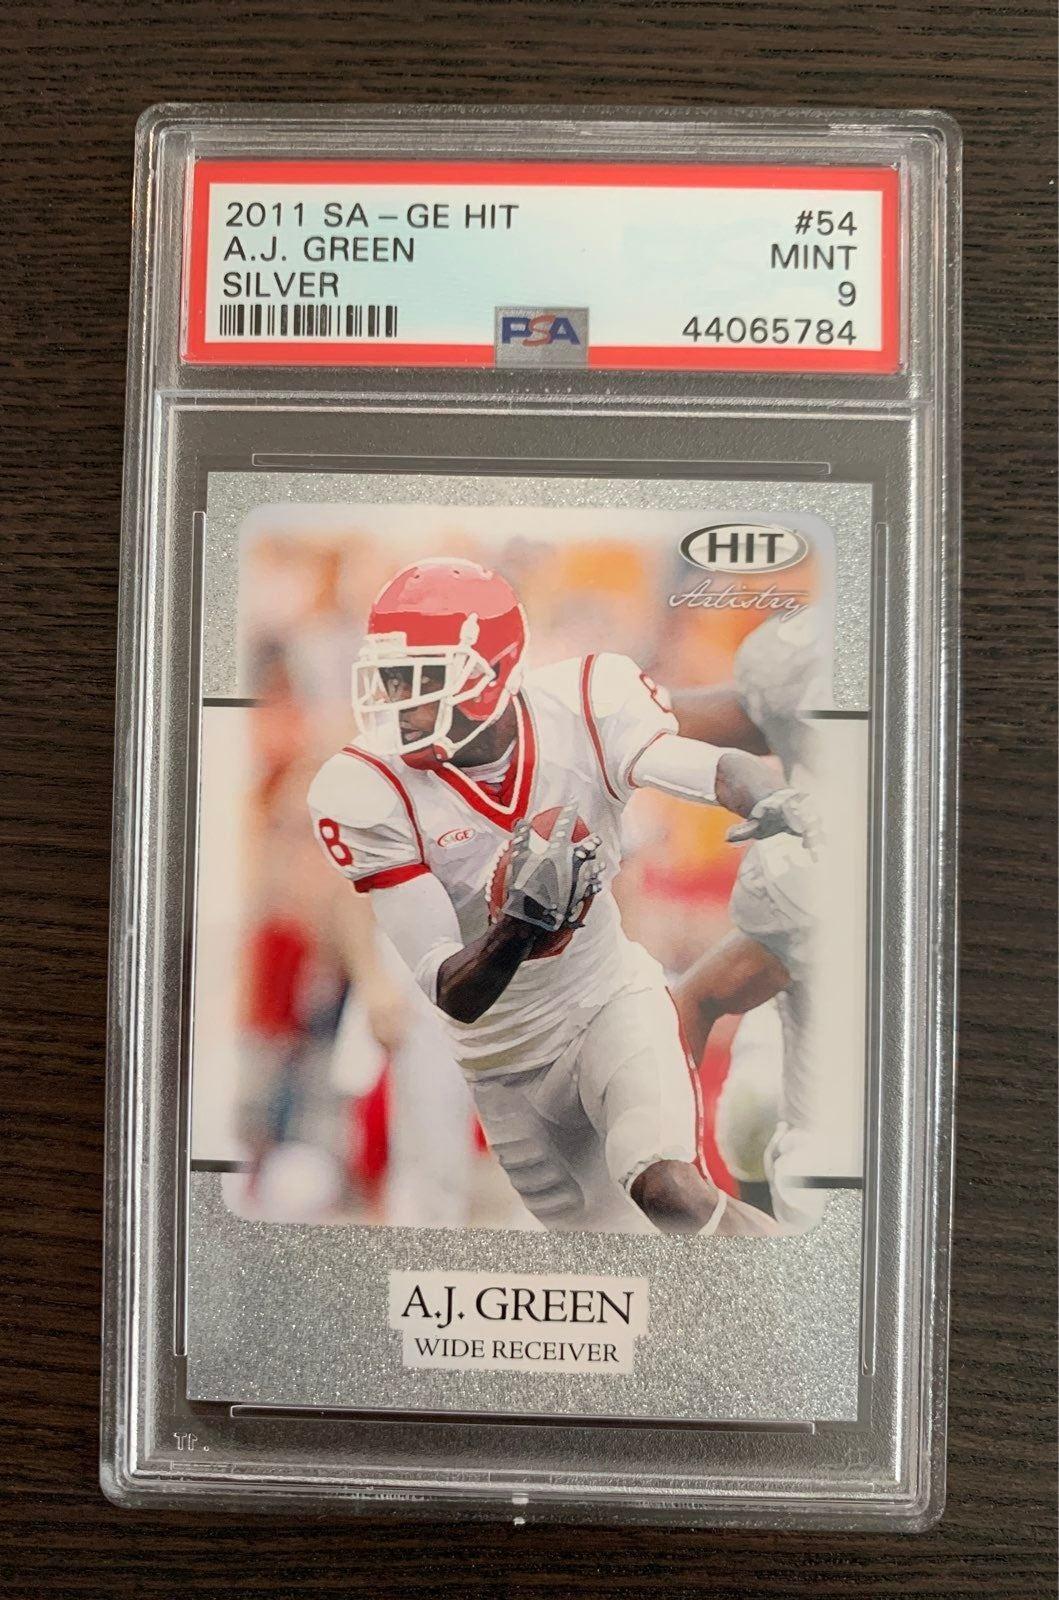 AJ Green Sage Hit Card